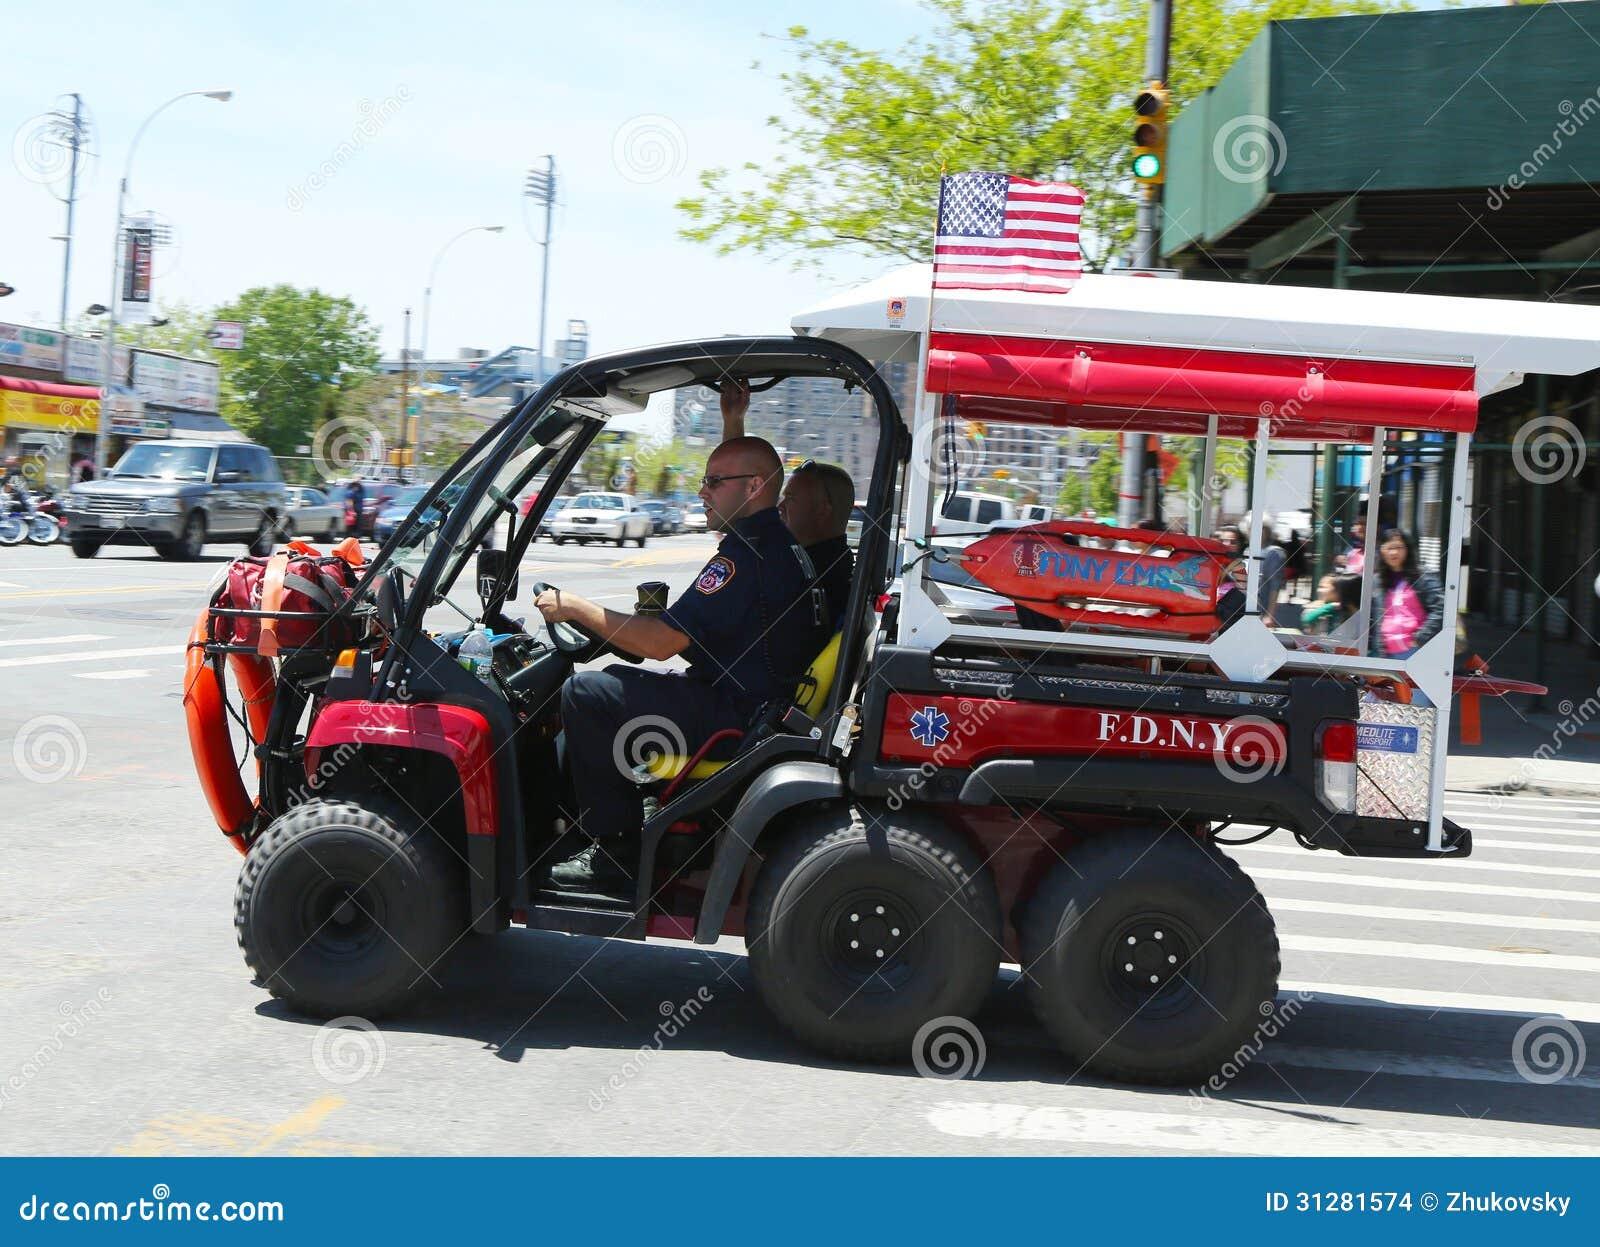 Best Car Service Brooklyn